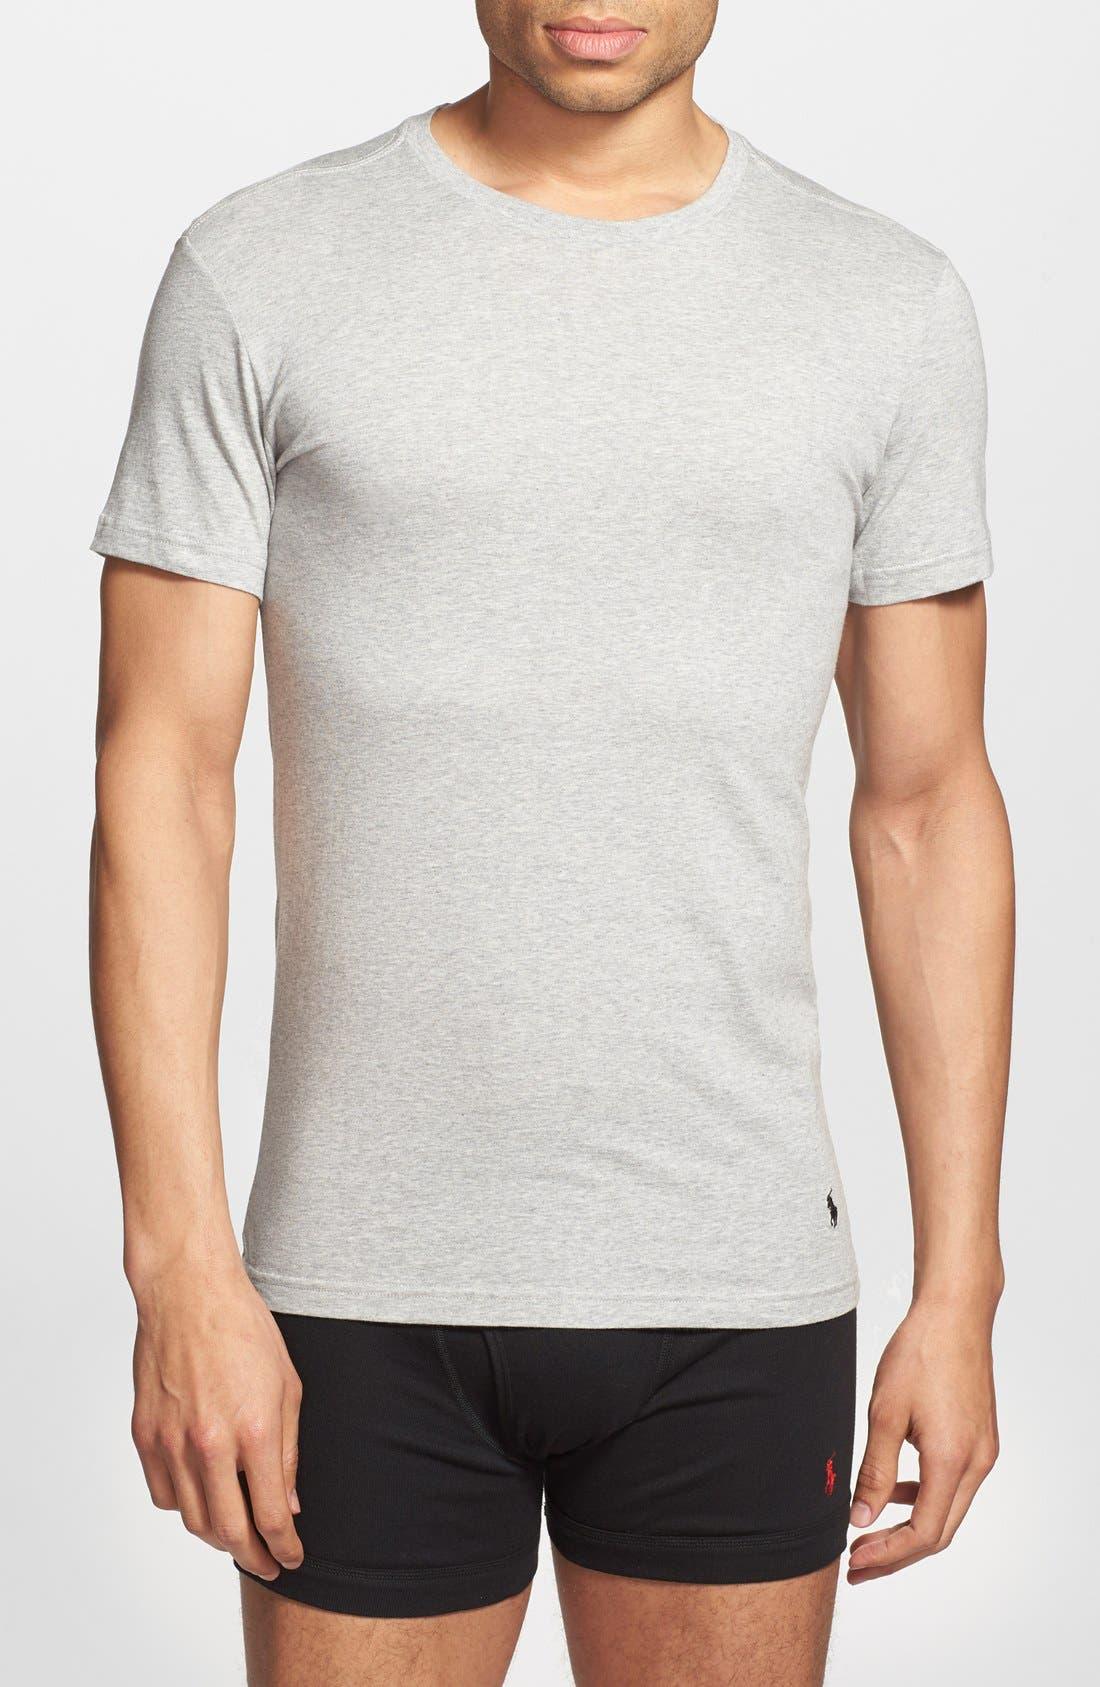 3-Pack Slim Fit T-Shirt,                             Alternate thumbnail 2, color,                             BLACK/ GREY/ CHARCOAL